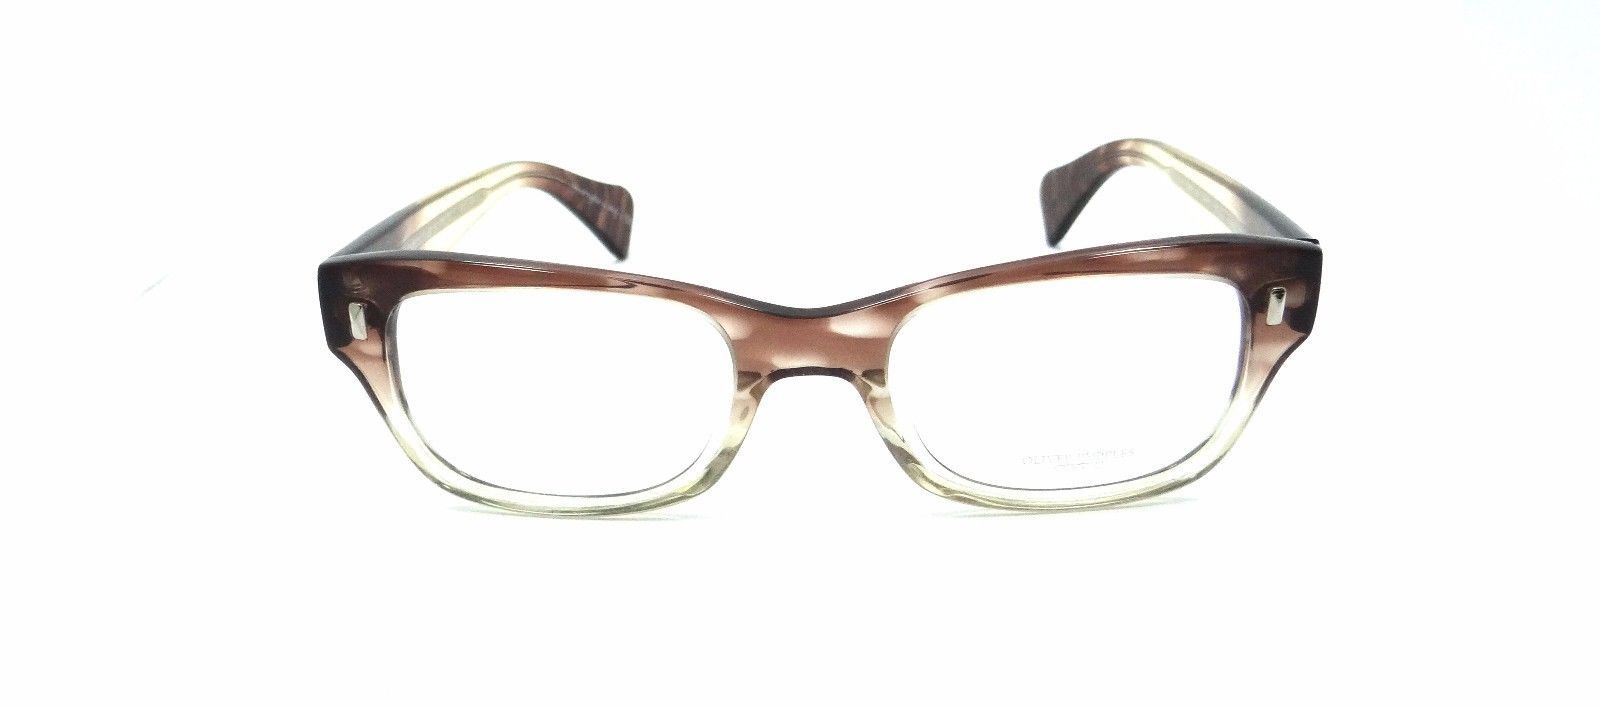 b2a3dfe74e6 ... Oliver Peoples Rx Eyeglasses Frames Wacks 5174 1470 49x19 Henna  Gradient Italy ...